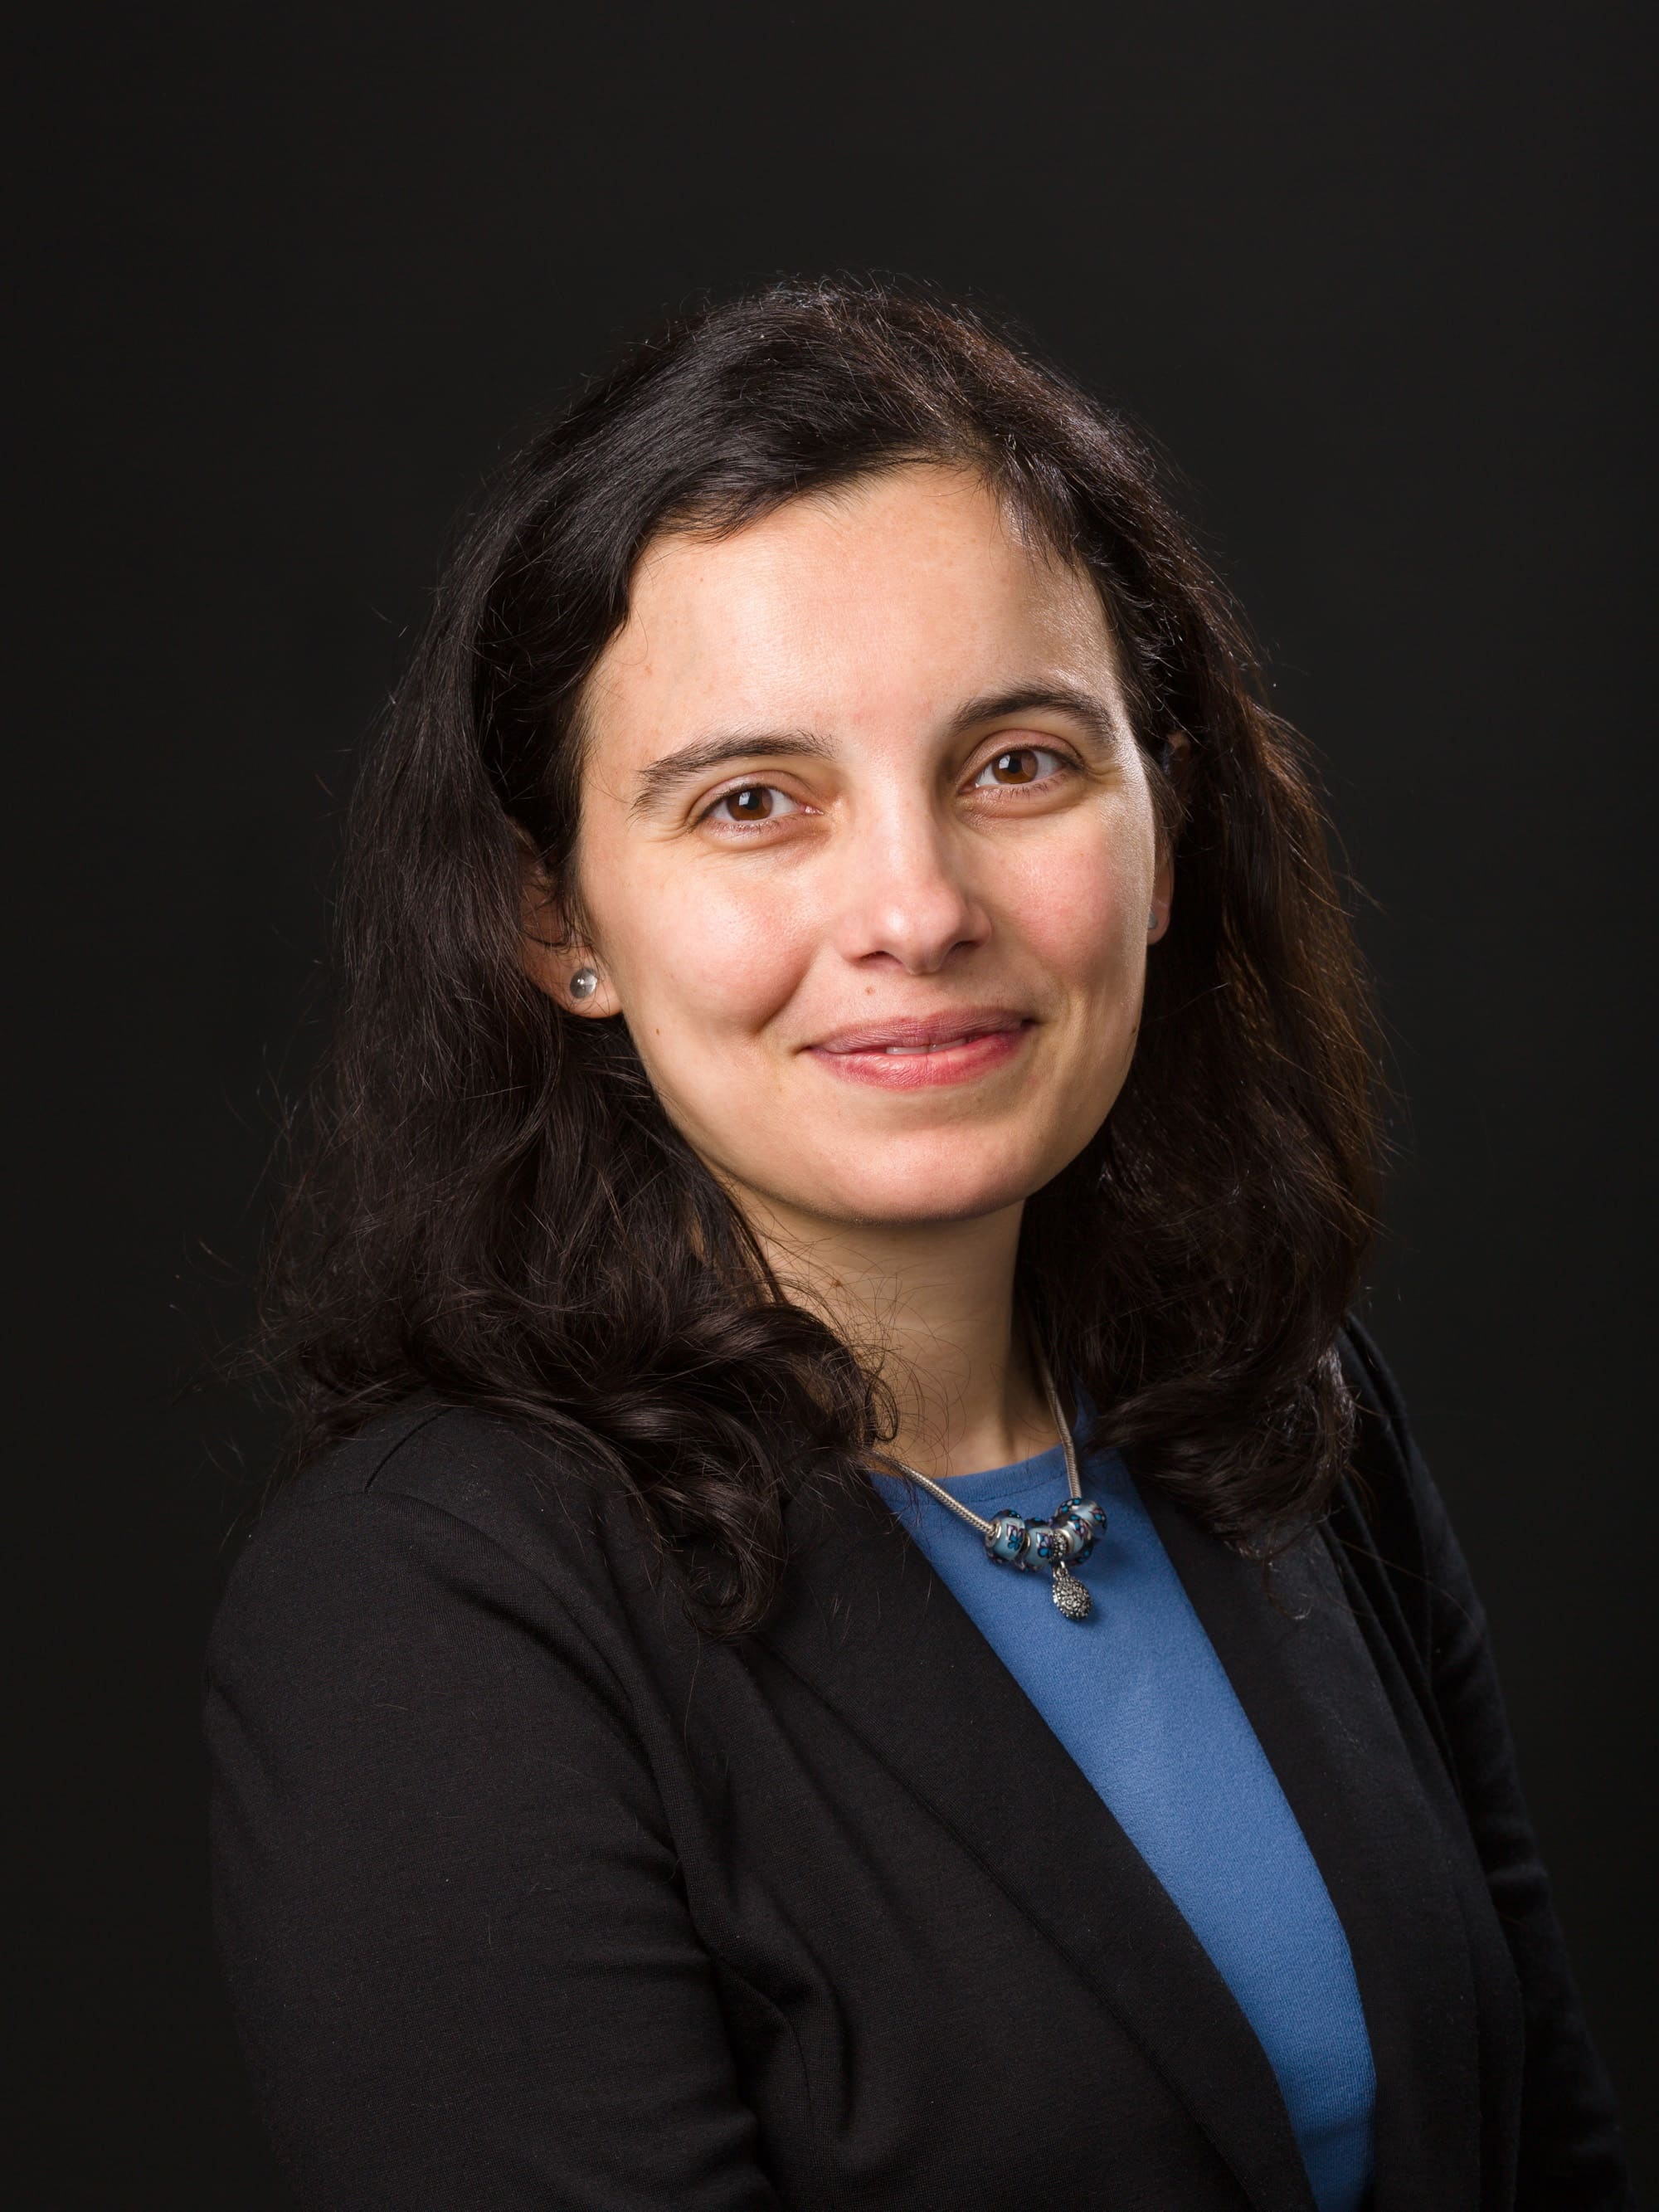 Silvia Vilarinho